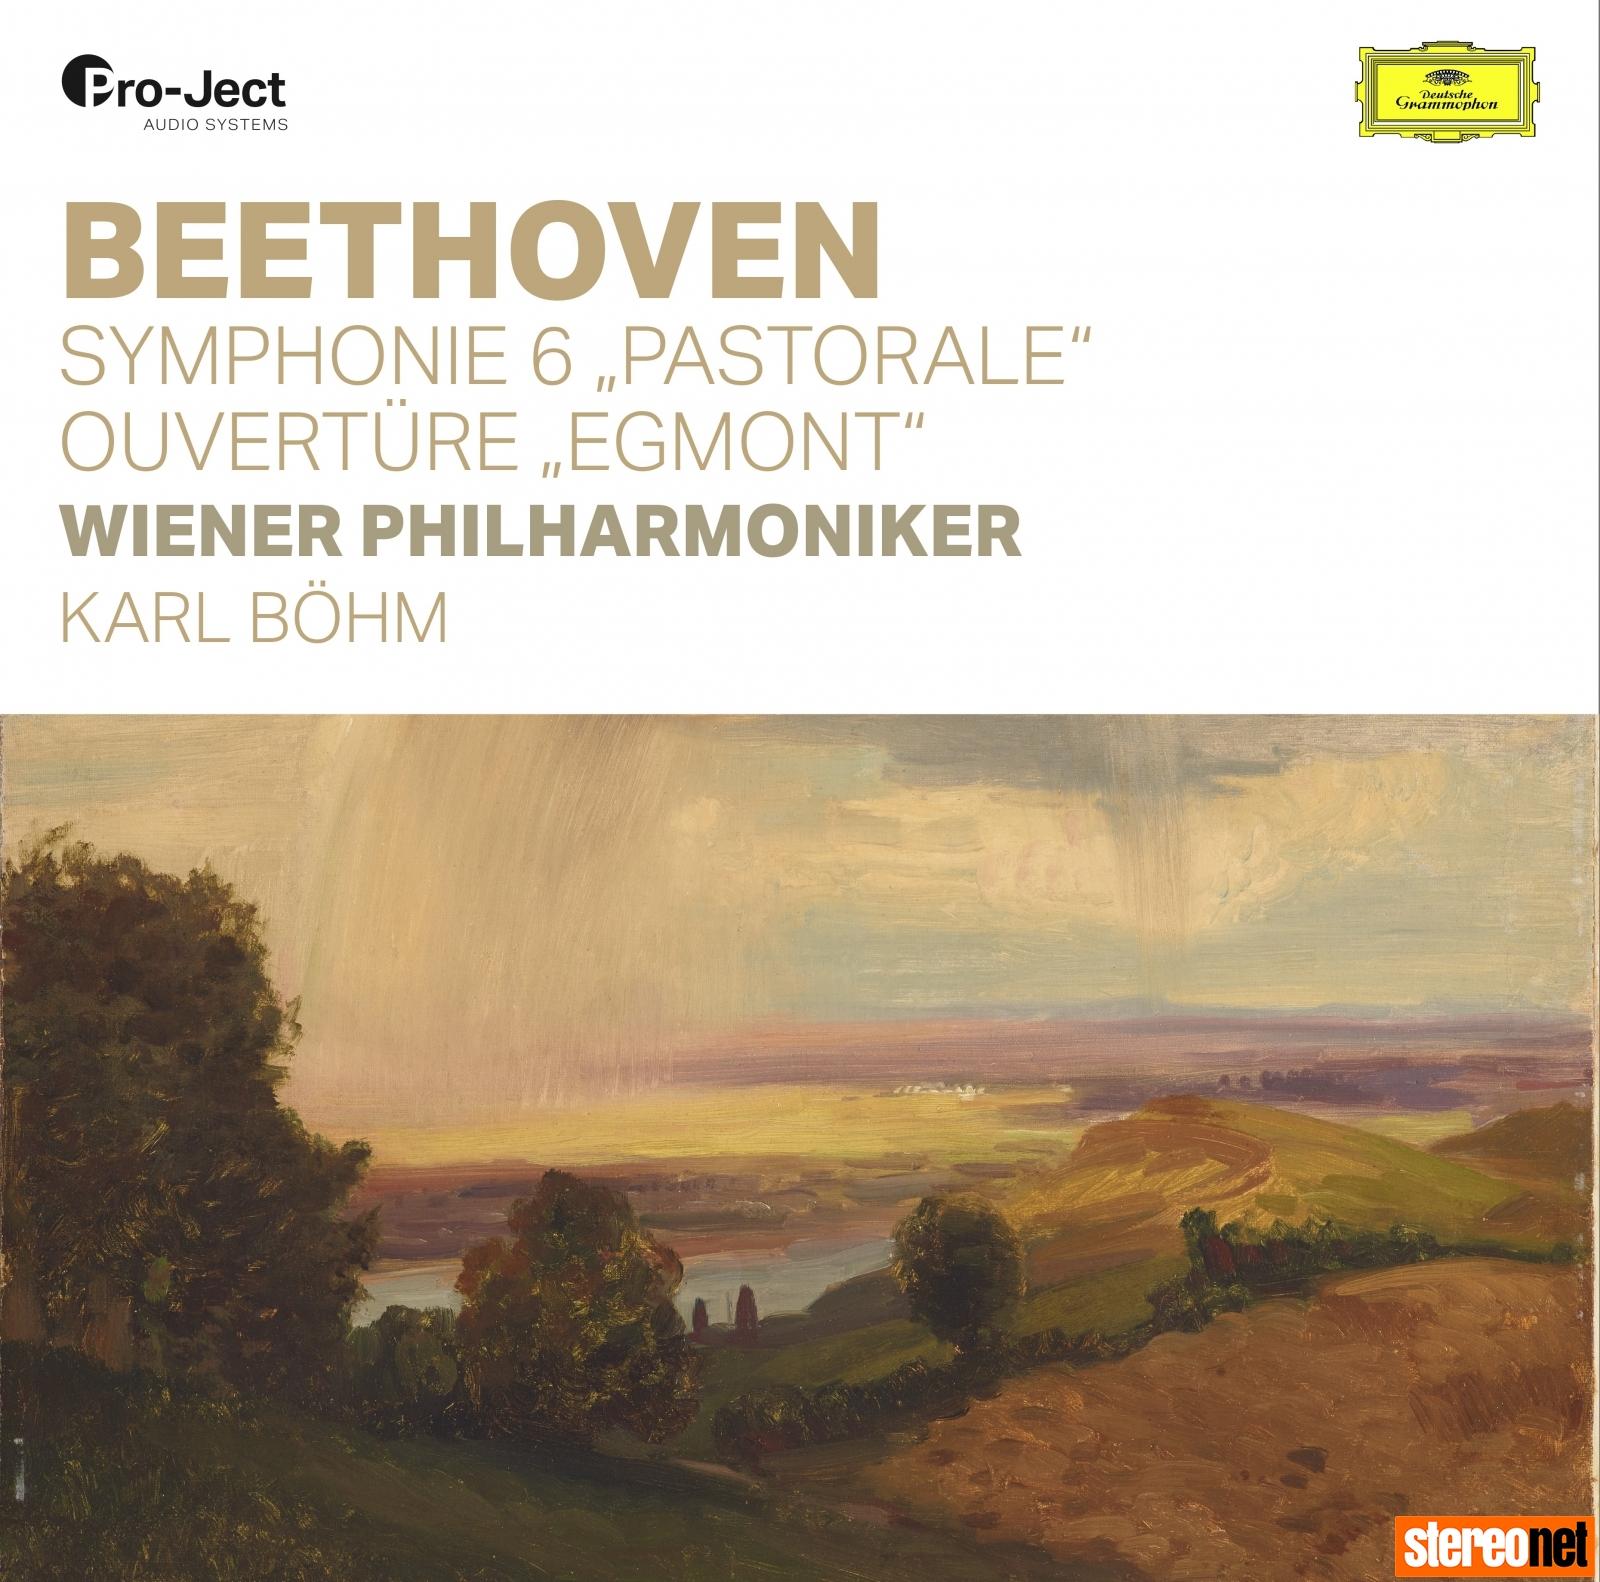 Vienna Philharmonic Orchestra Pro-Ject Music